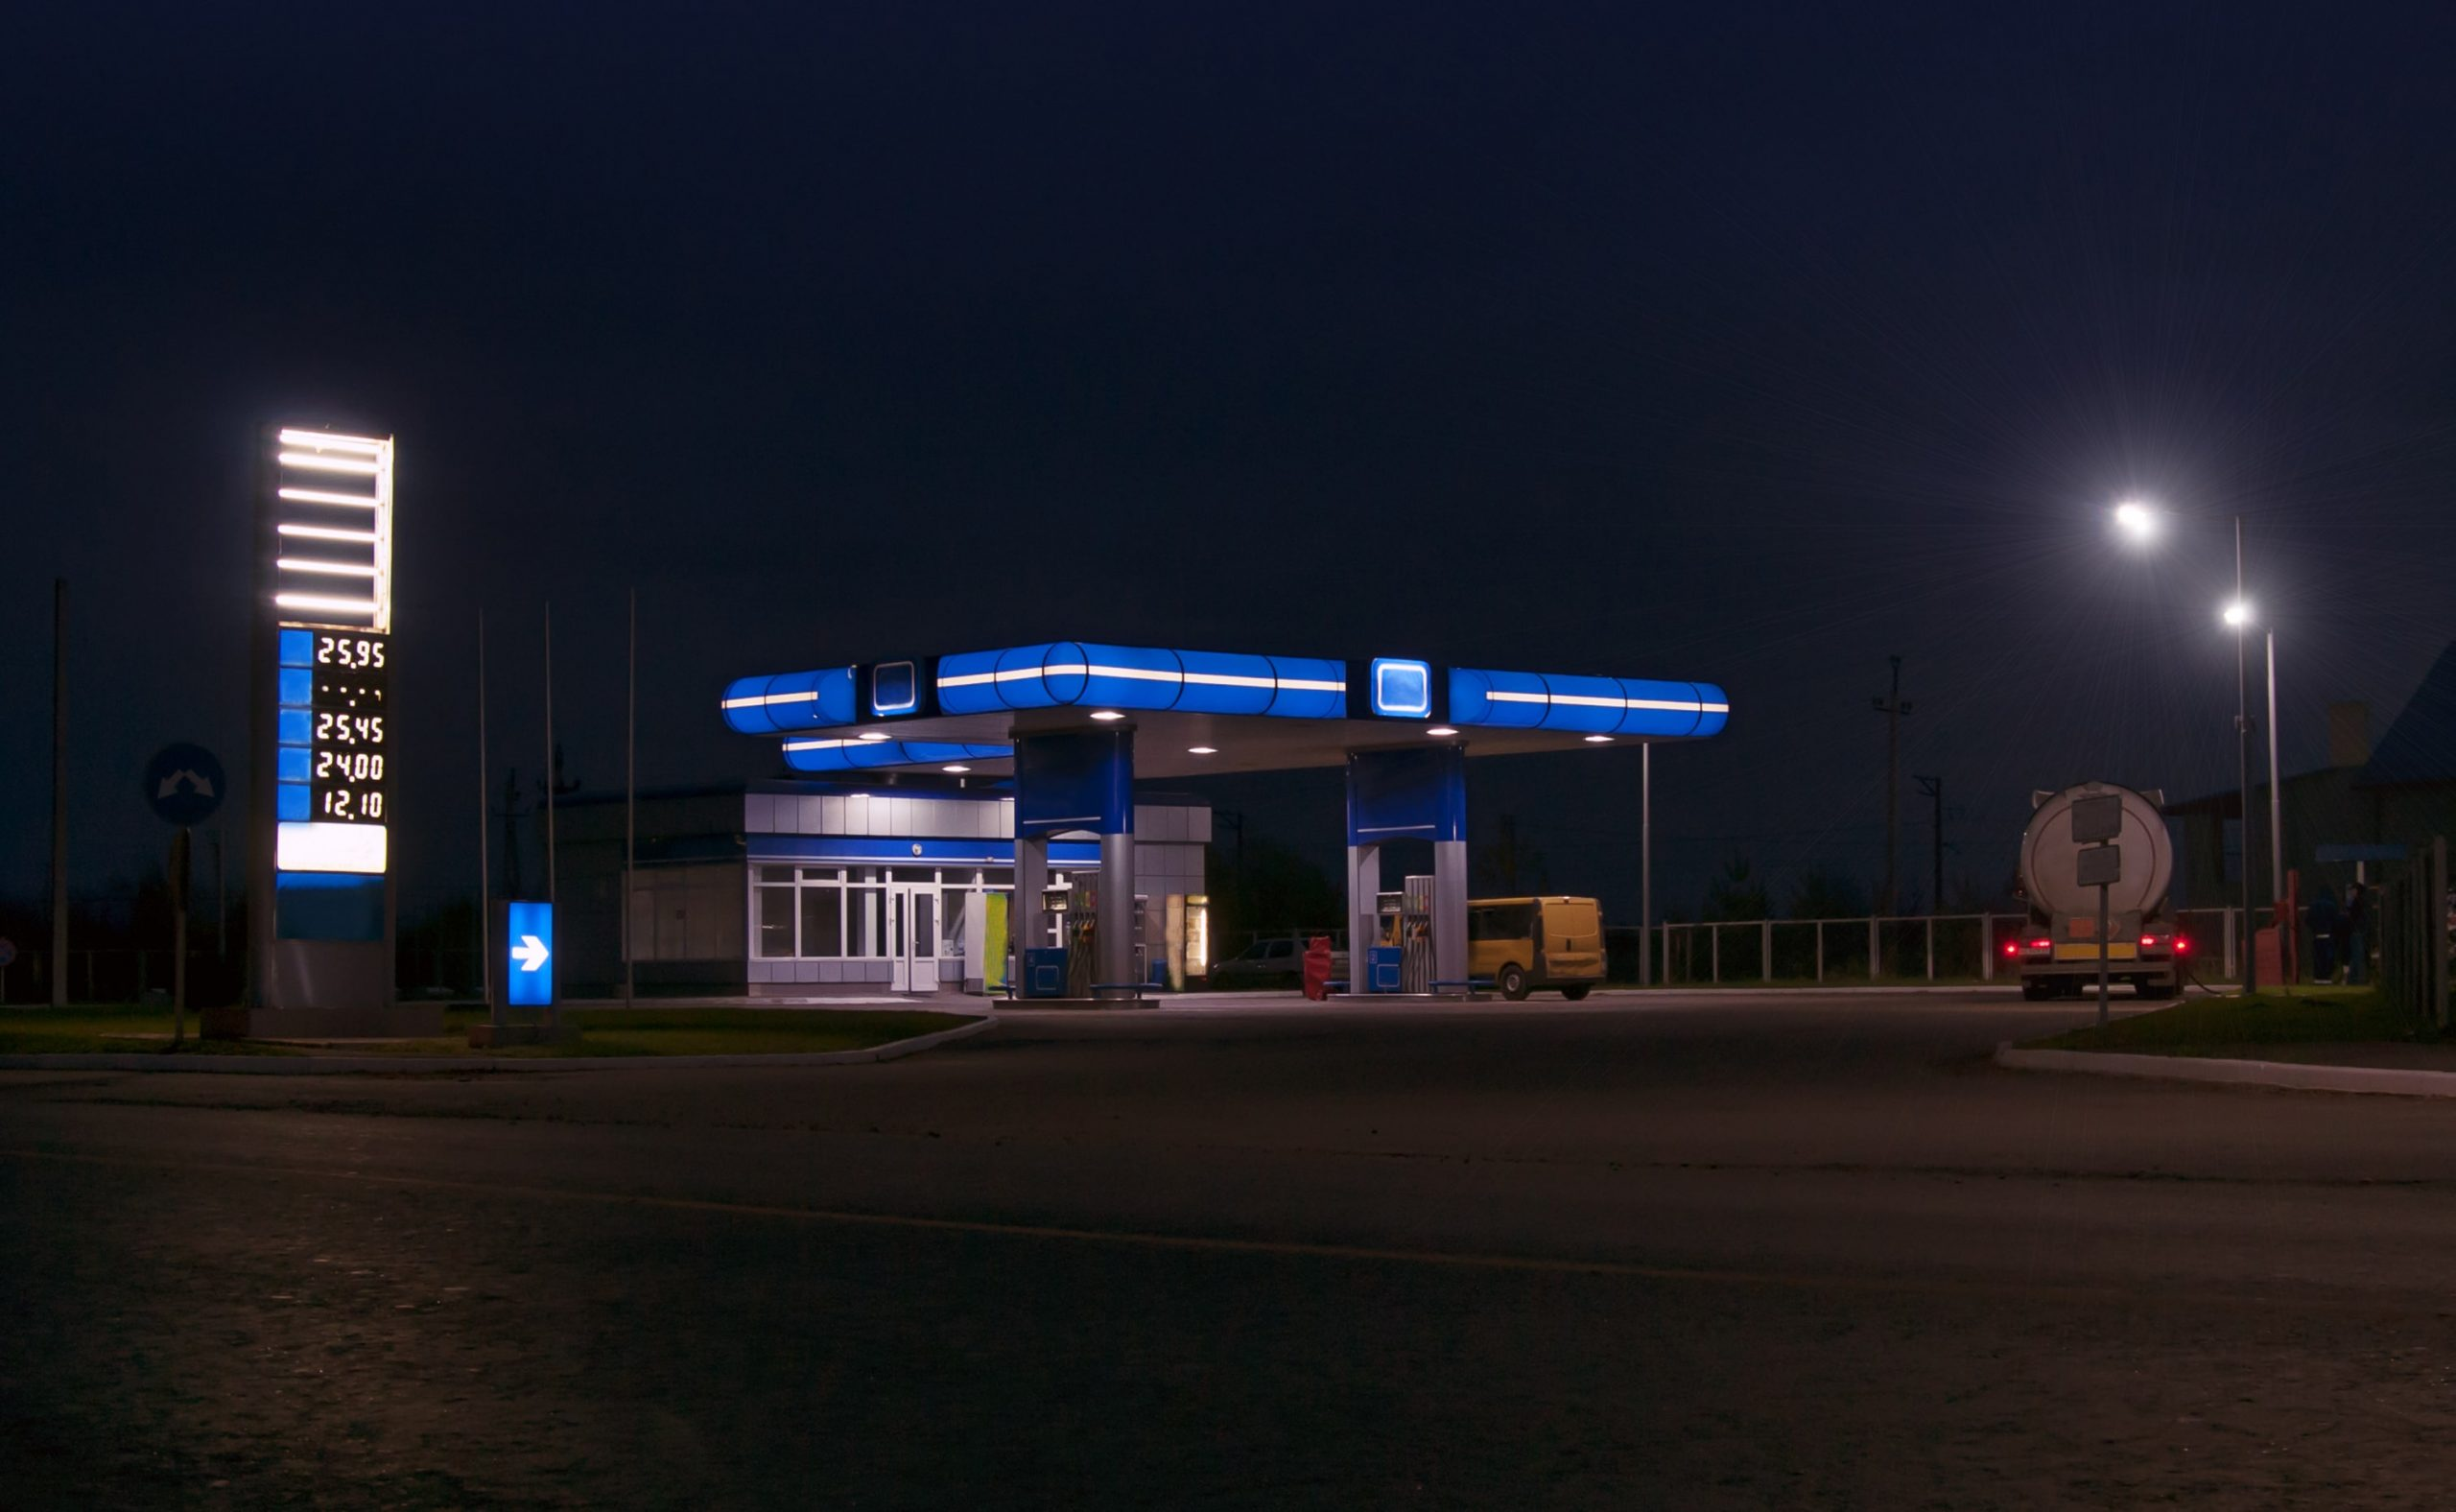 gas-station-and-convenience-PRWVE7Q-min